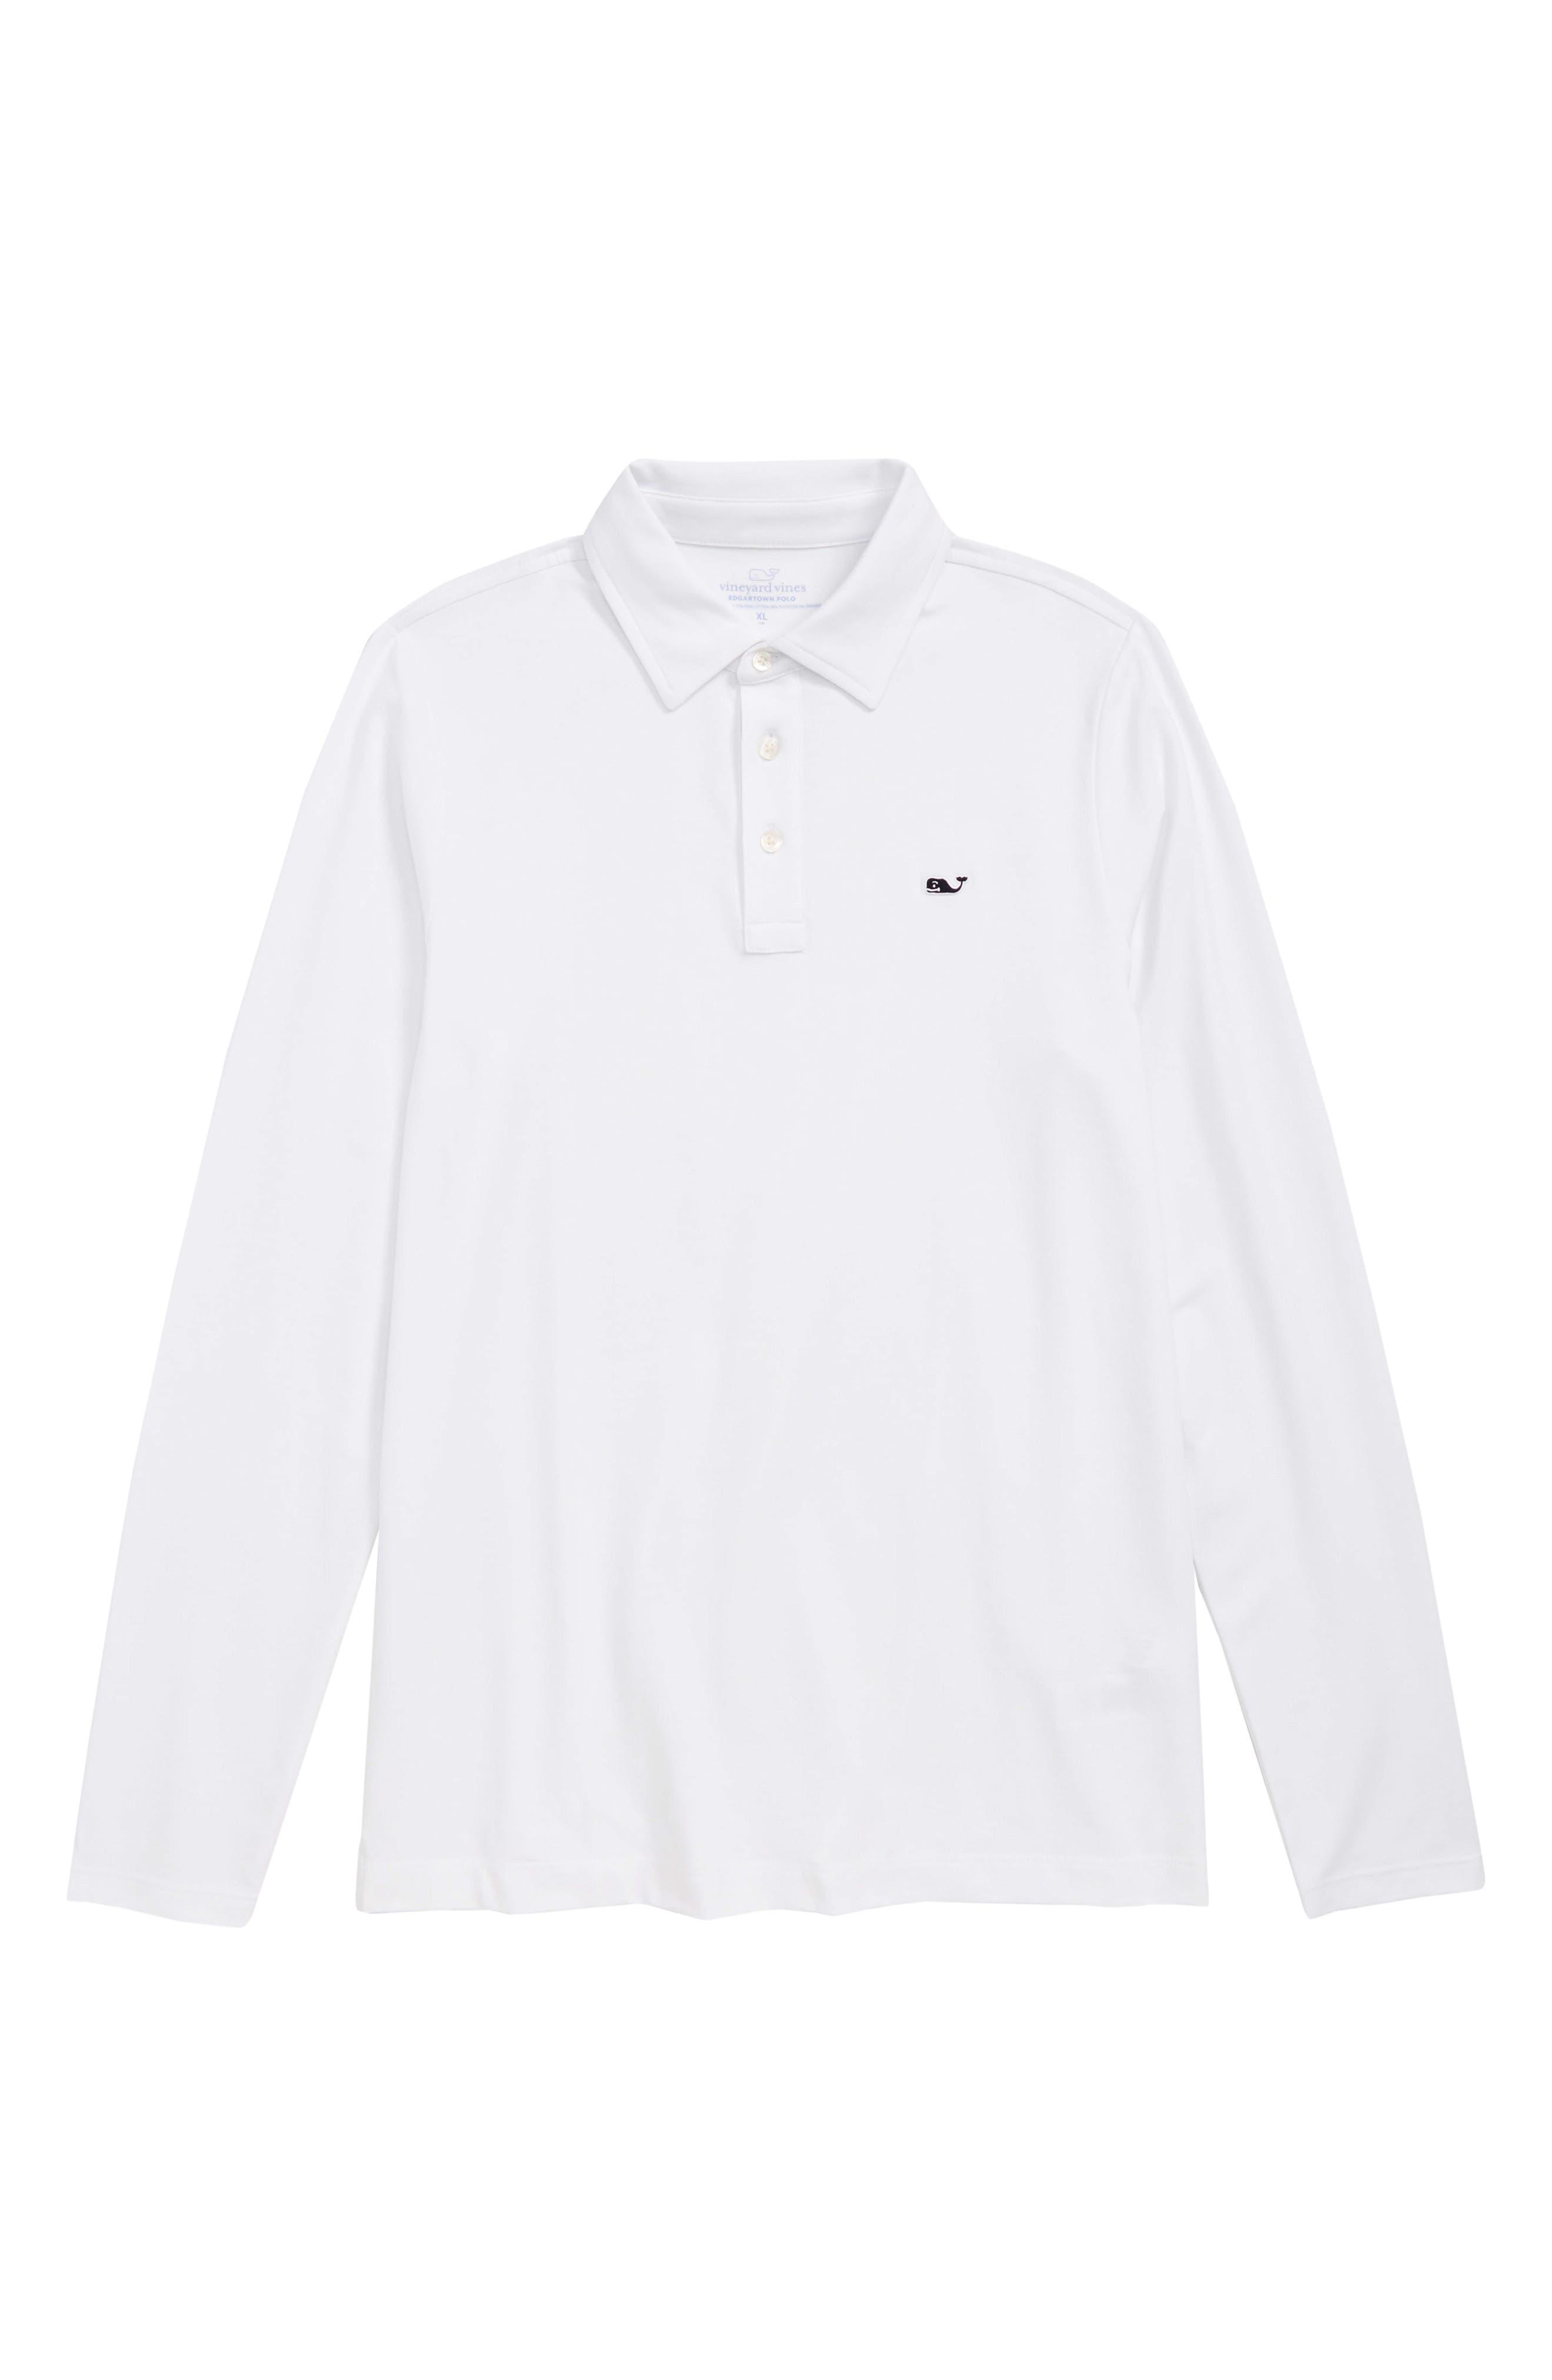 Edgartown Long Sleeve Polo,                             Main thumbnail 1, color,                             WHITE CAP